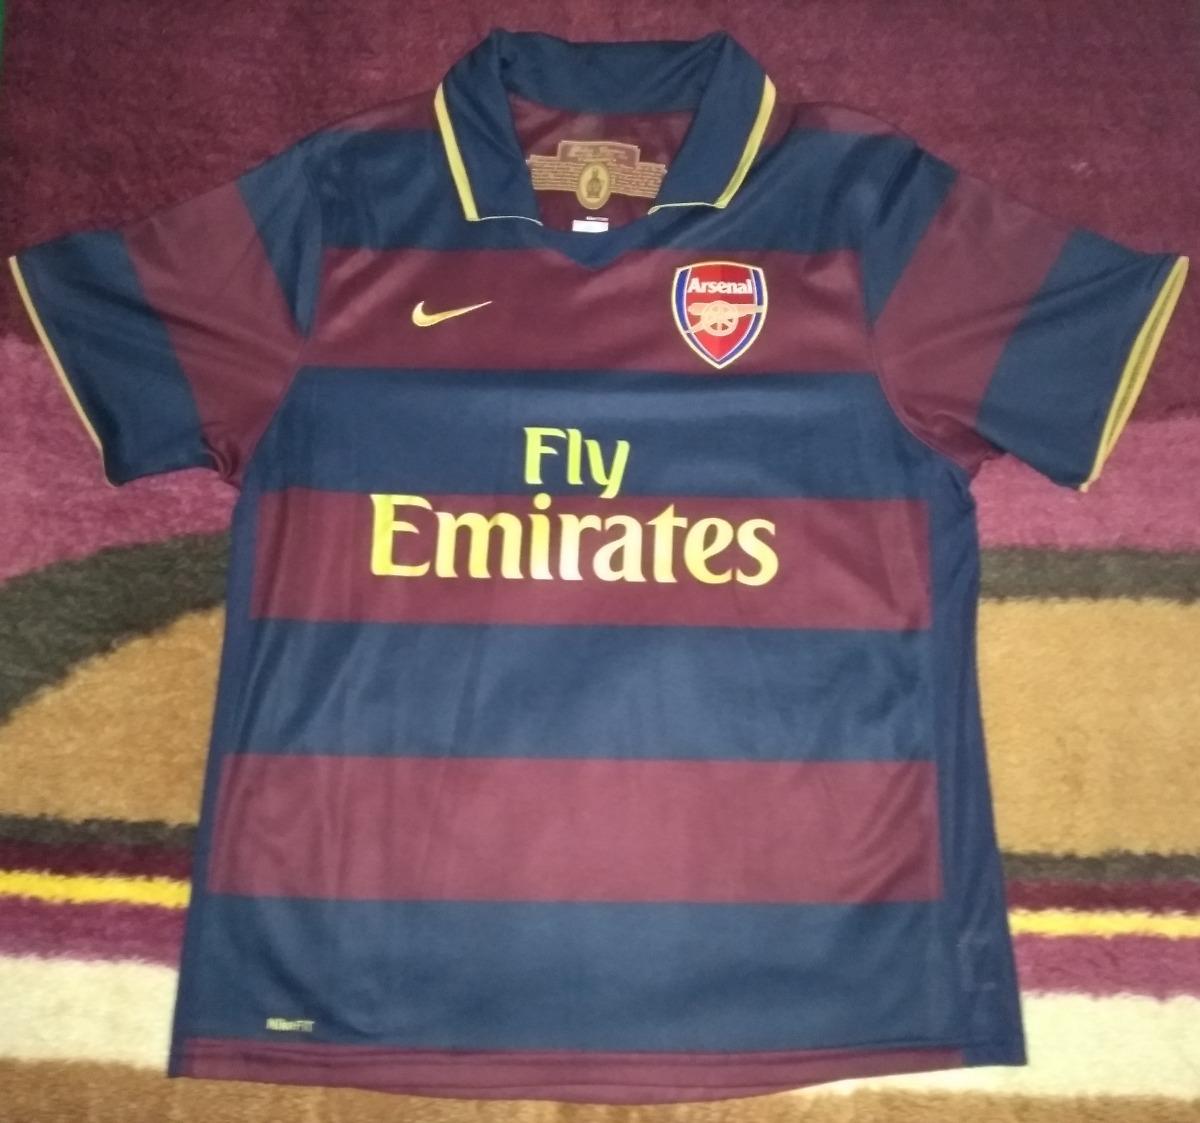 camisa arsenal 2007 2008 nike. Carregando zoom. e666d7d1ef06f